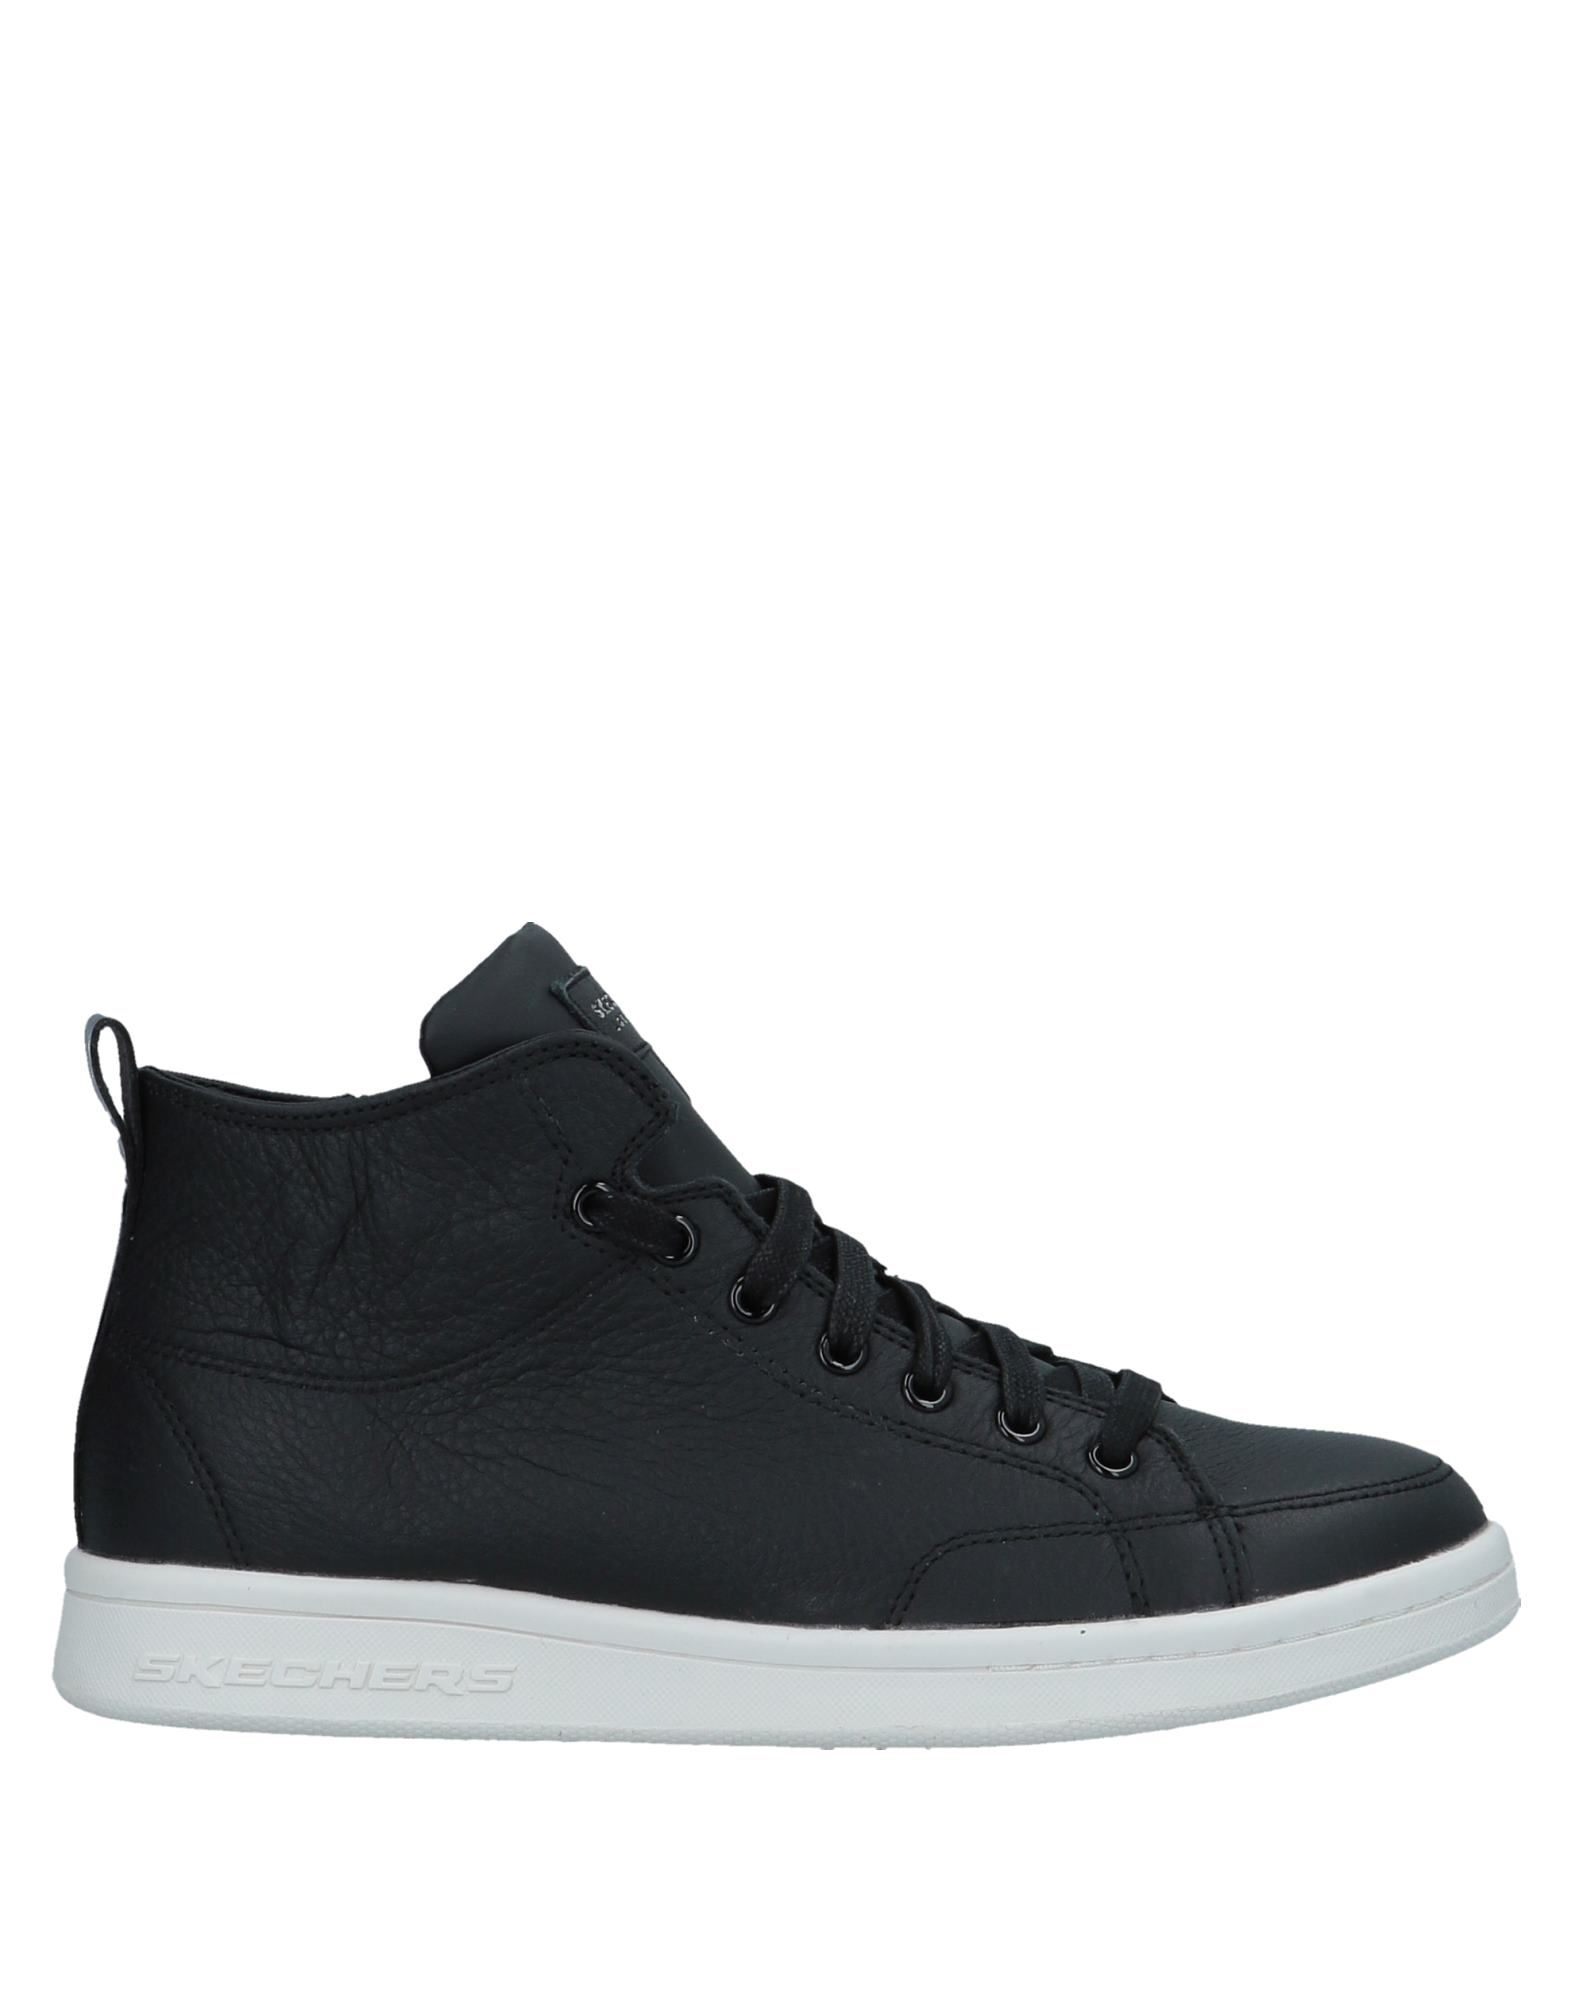 Moda Sneakers Skechers Donna - 11529194KK